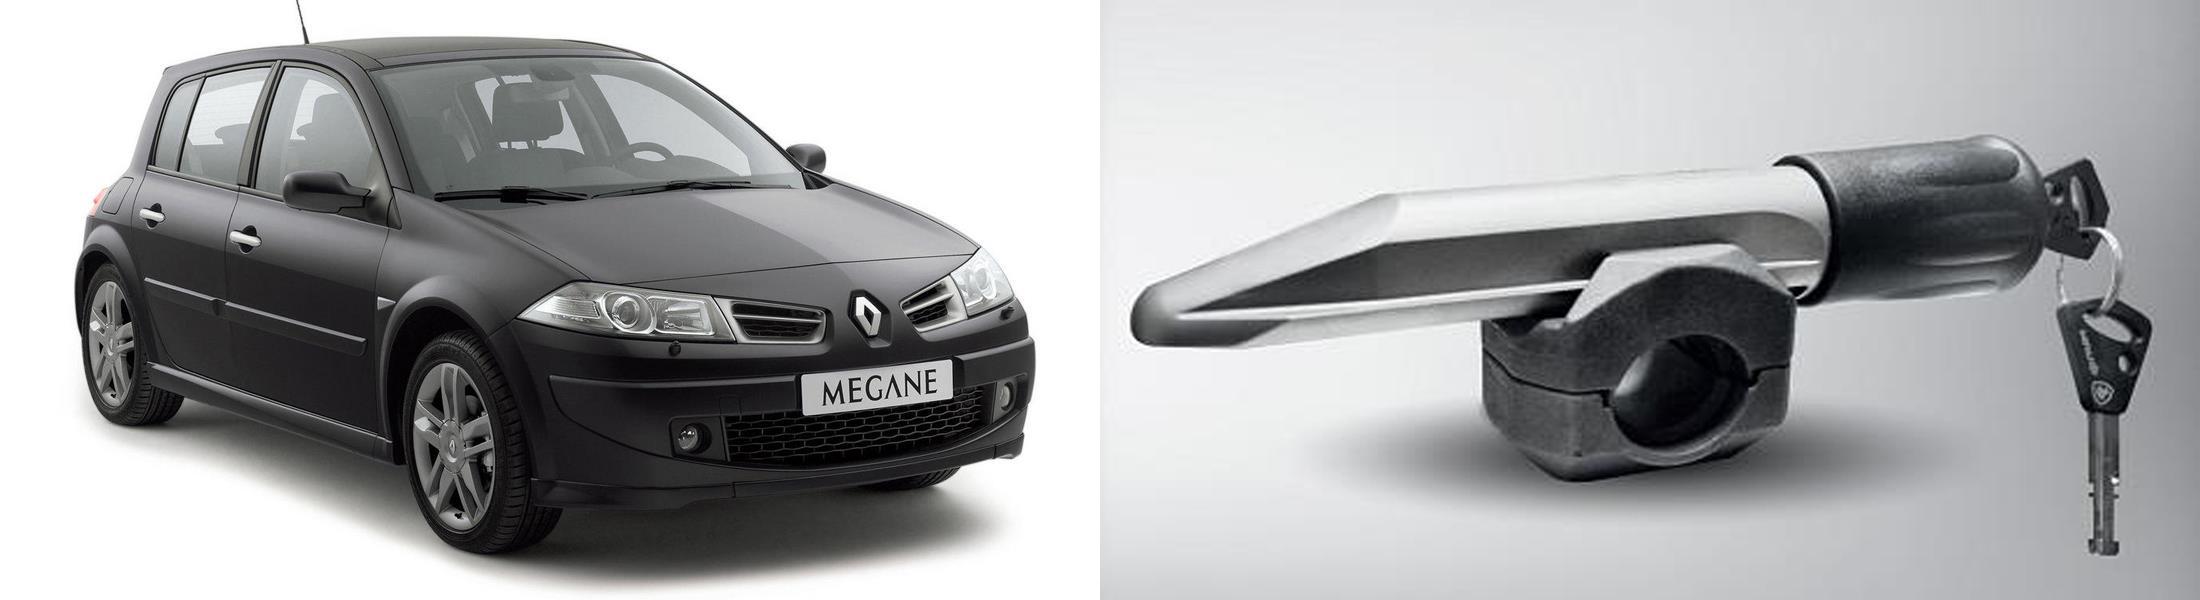 Renault Megane II 2-е пок.